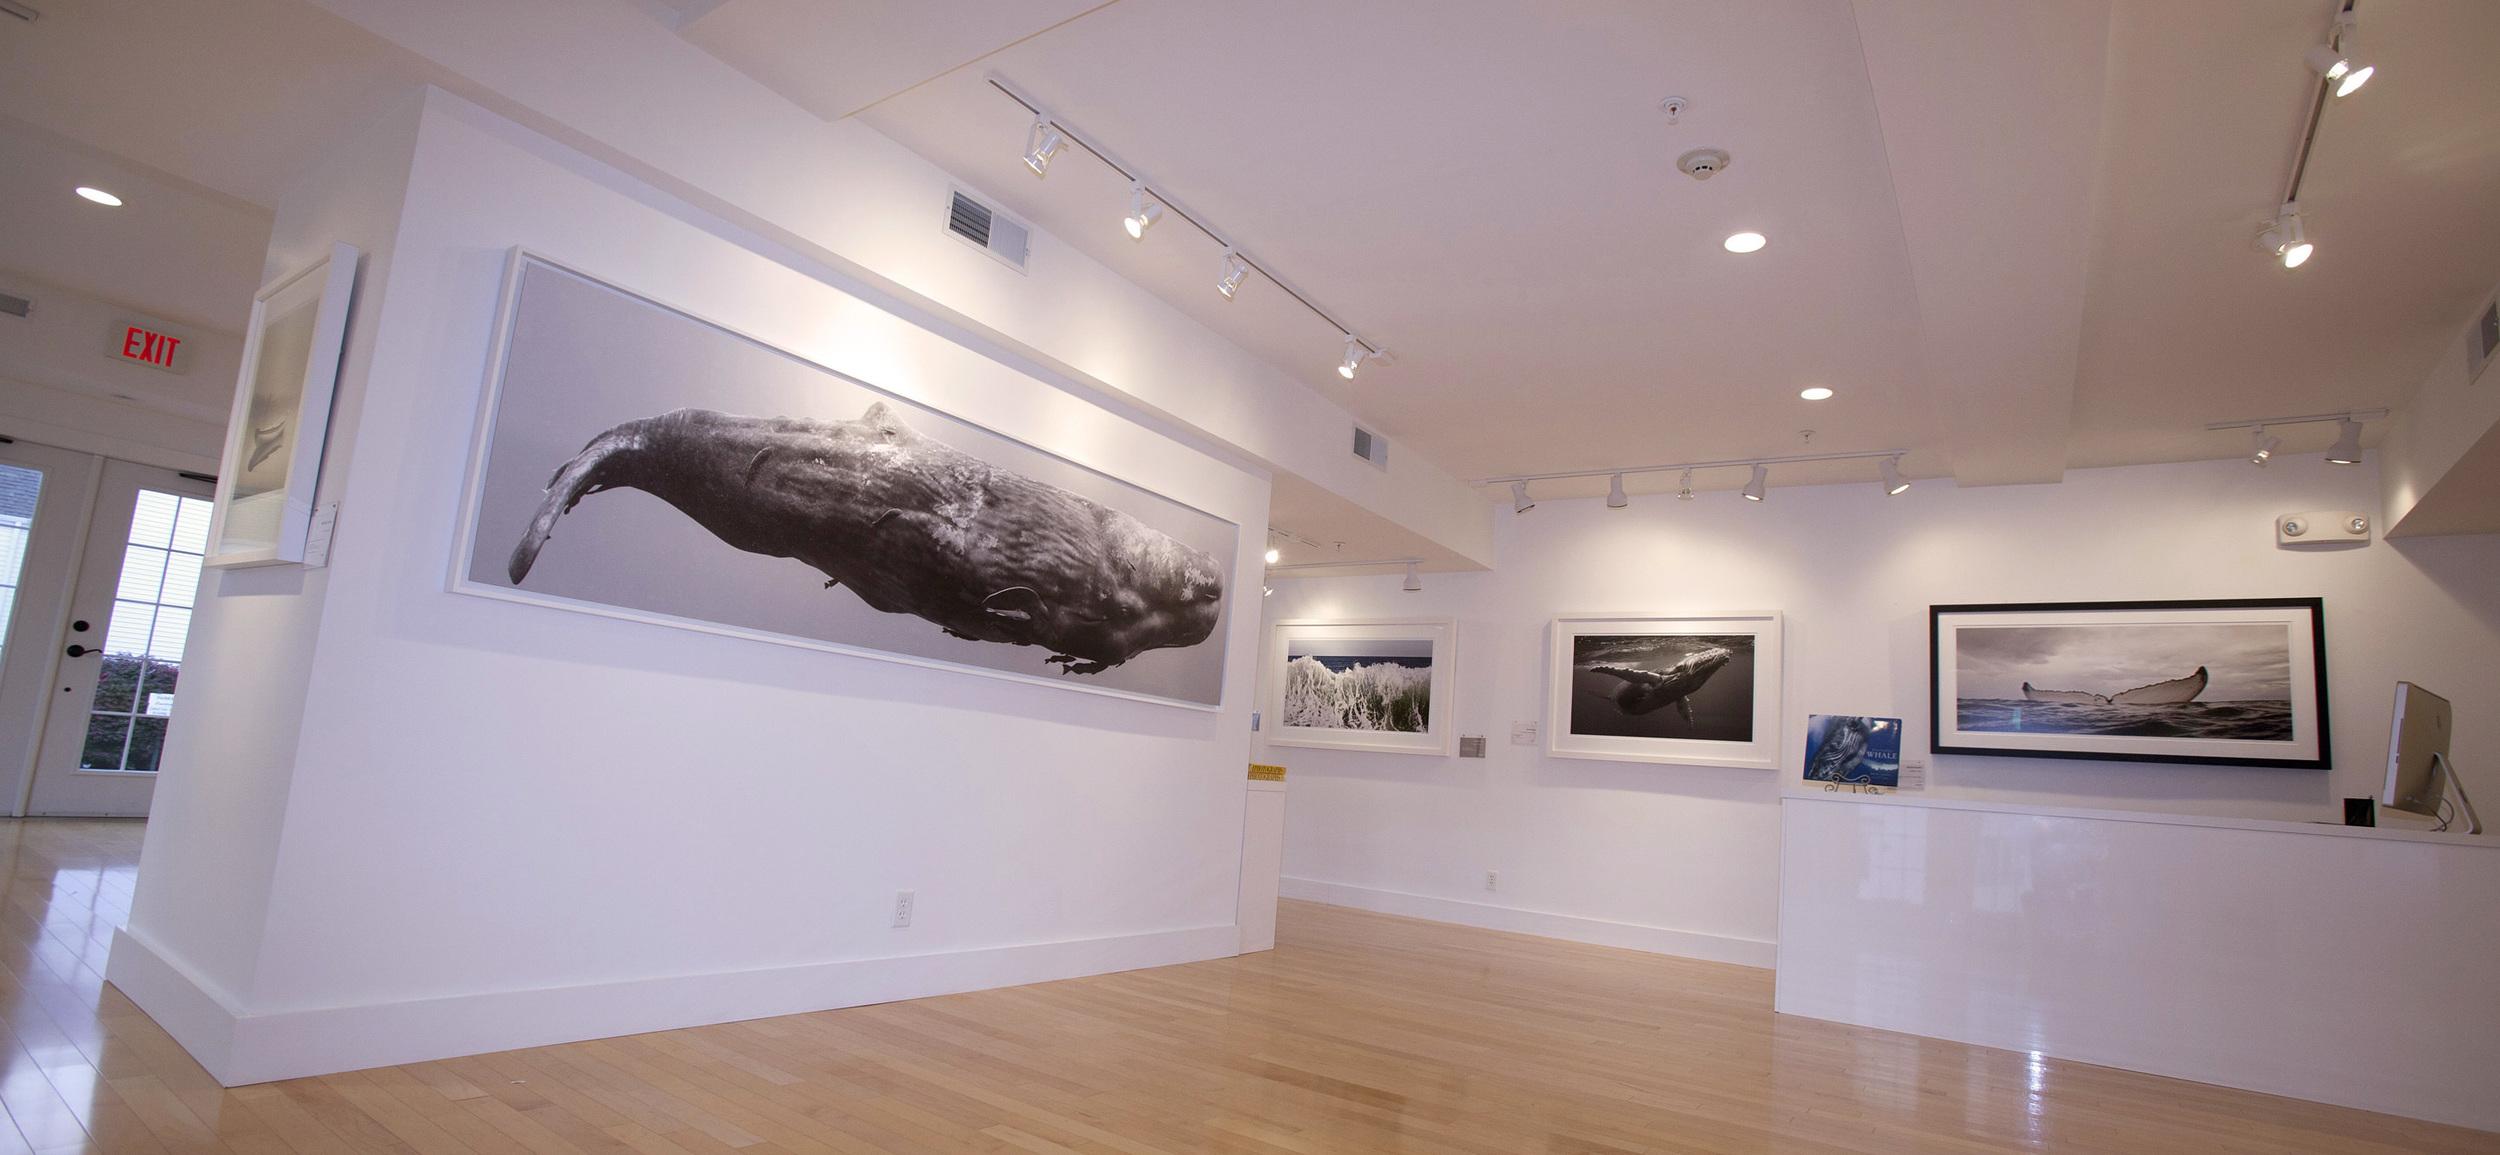 Whales 3.jpg